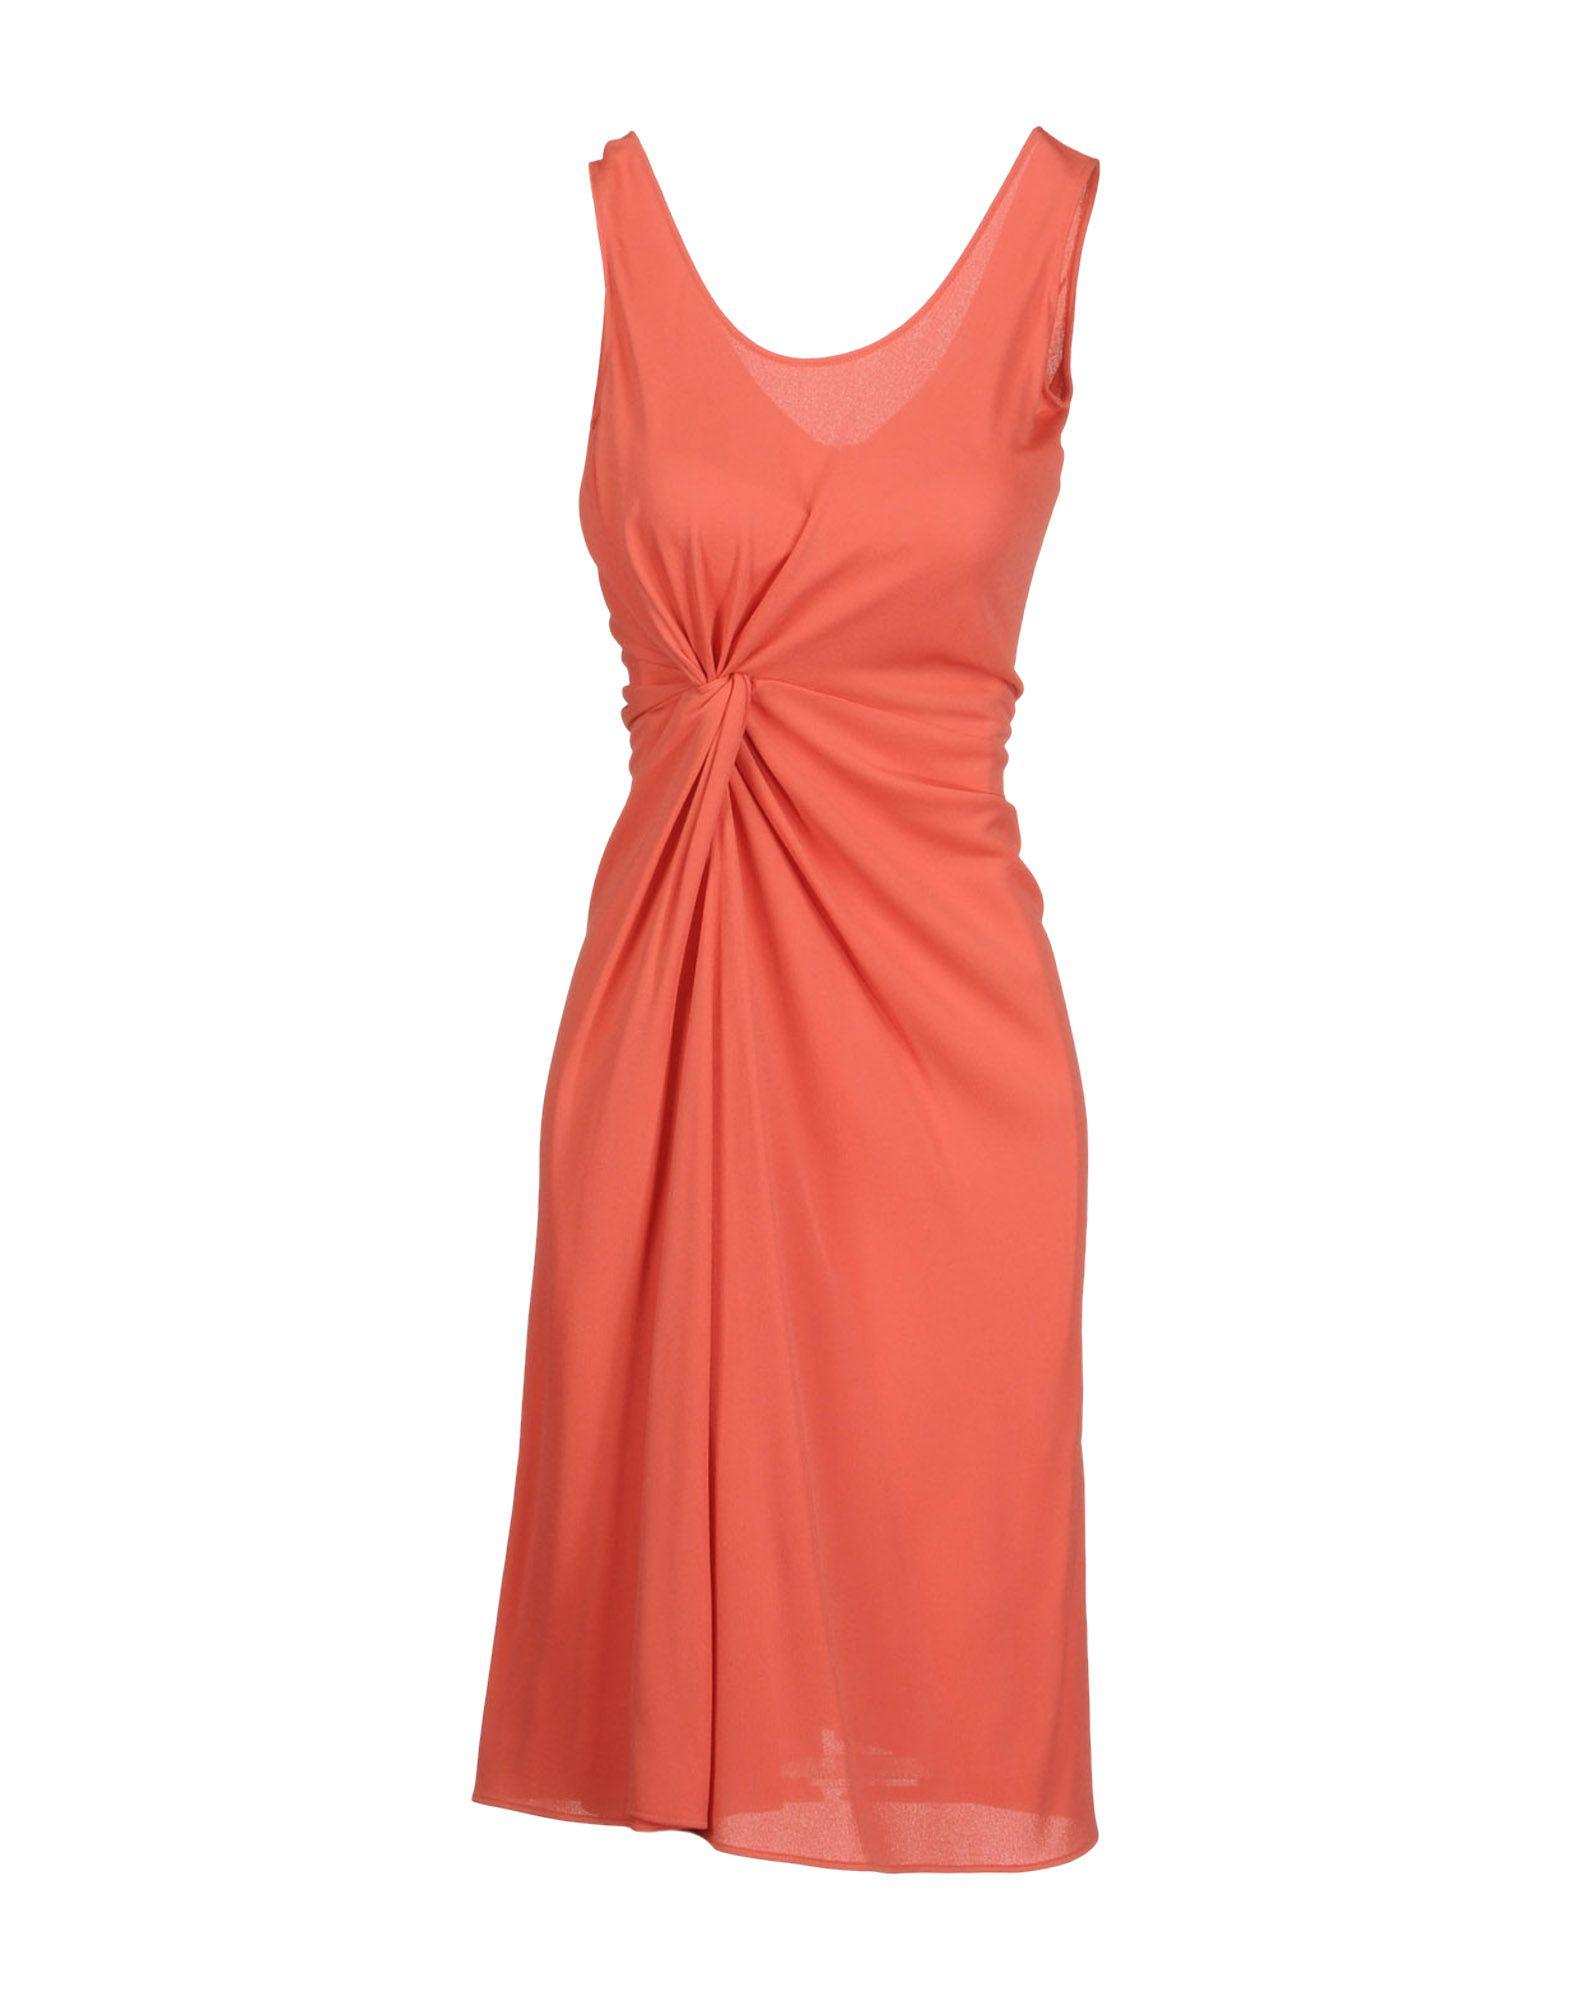 dior short dresses - photo #19